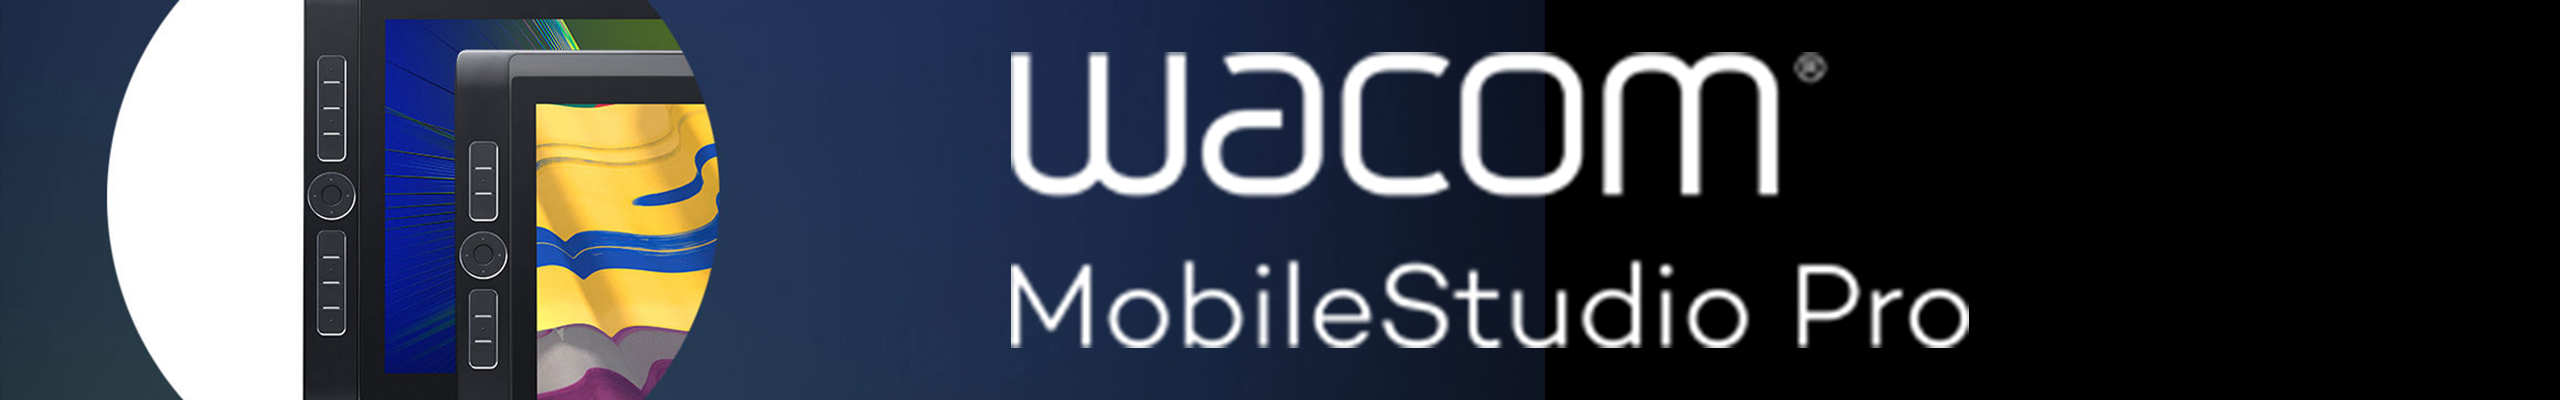 Wacom MobileStudio